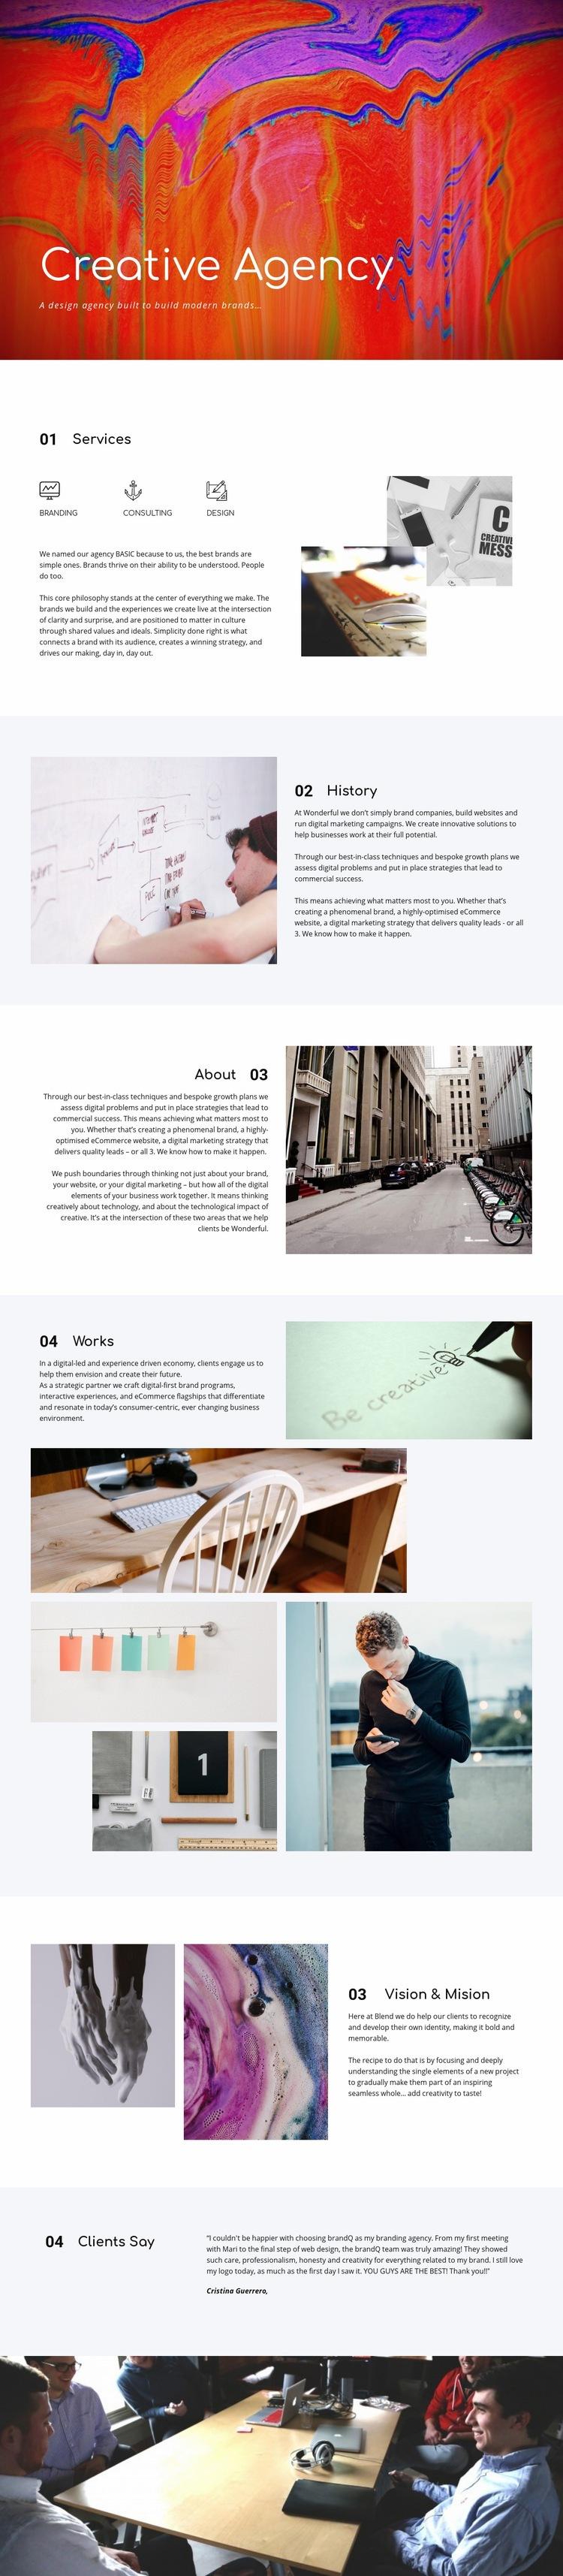 Creative gallery Html Code Example